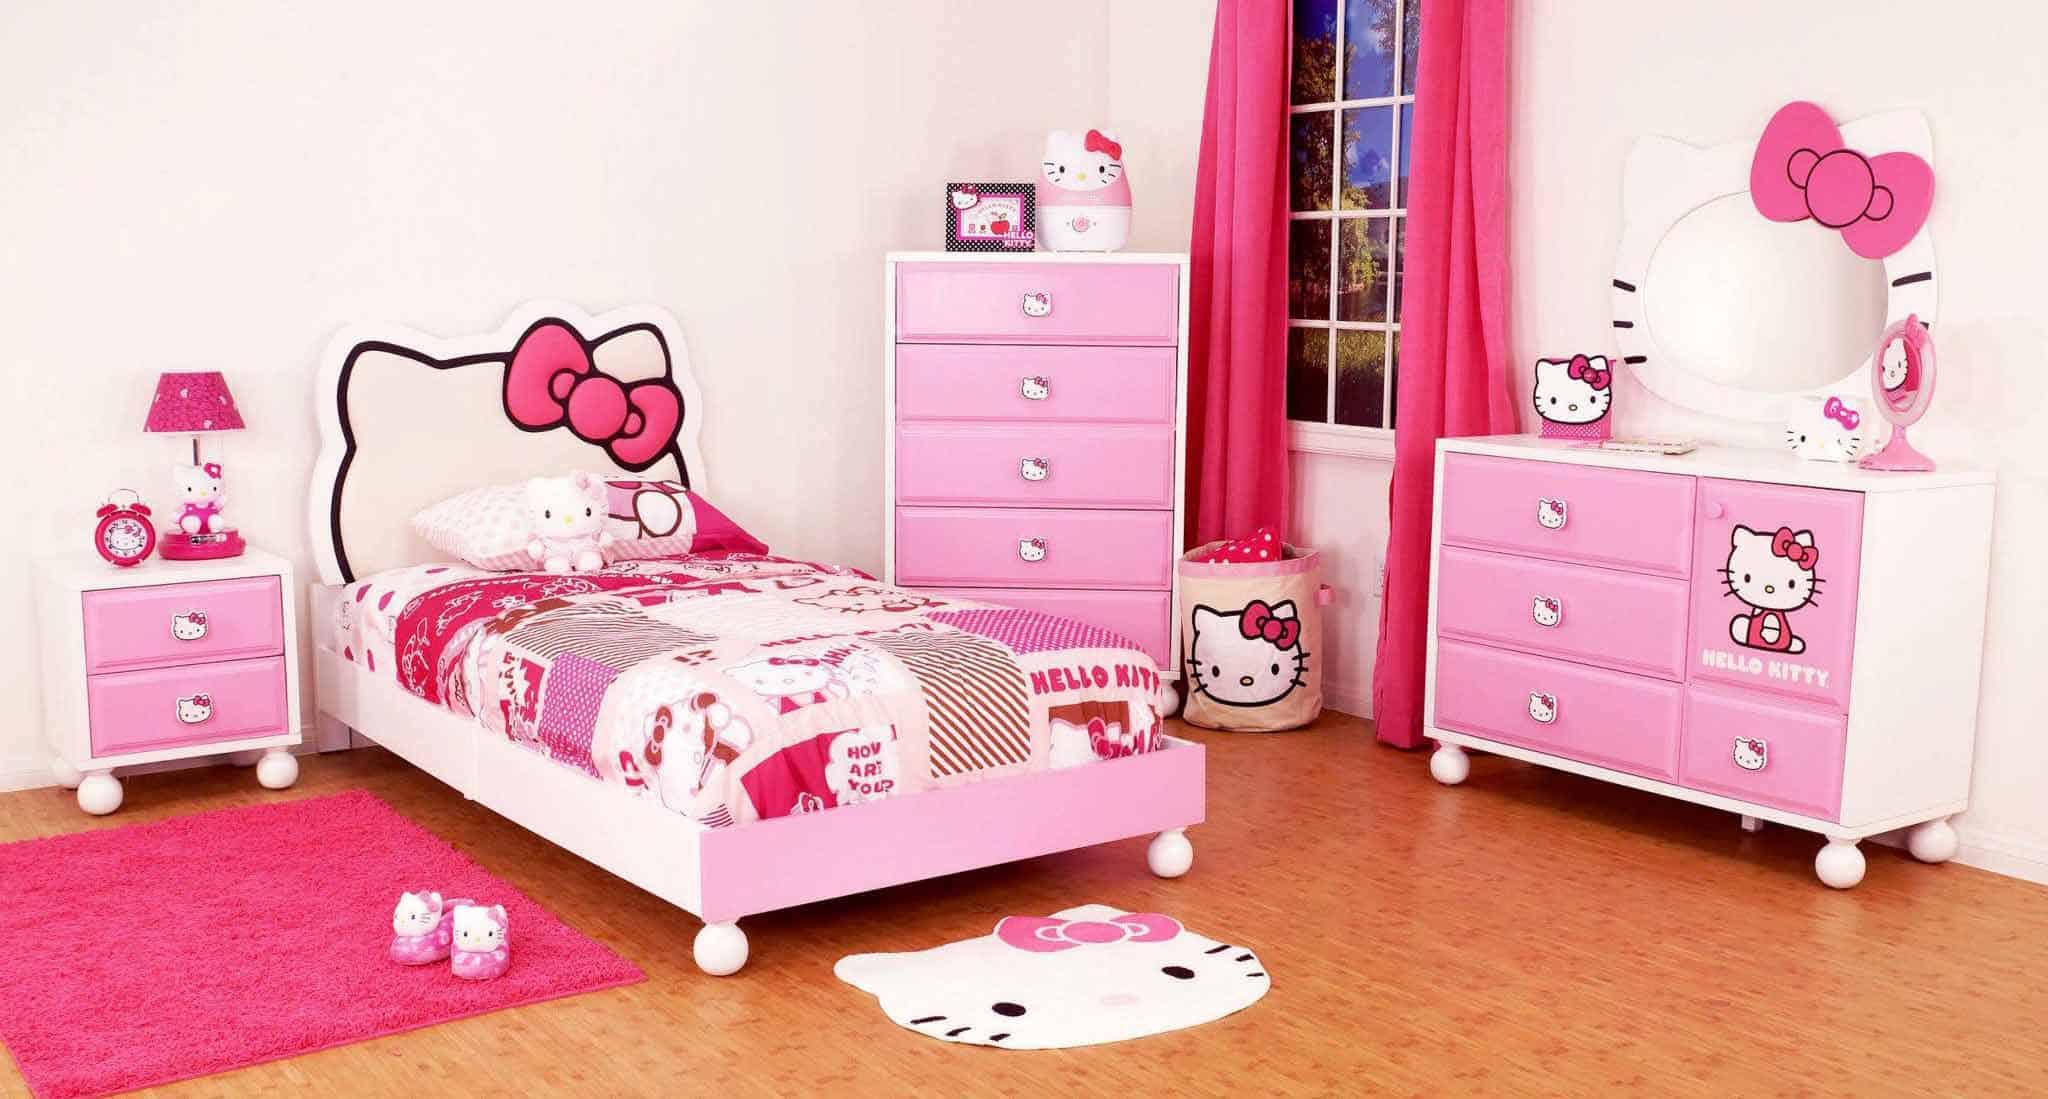 Desain Kamar Tidur Anak Motif Hello Kitty PasarSemarangCom